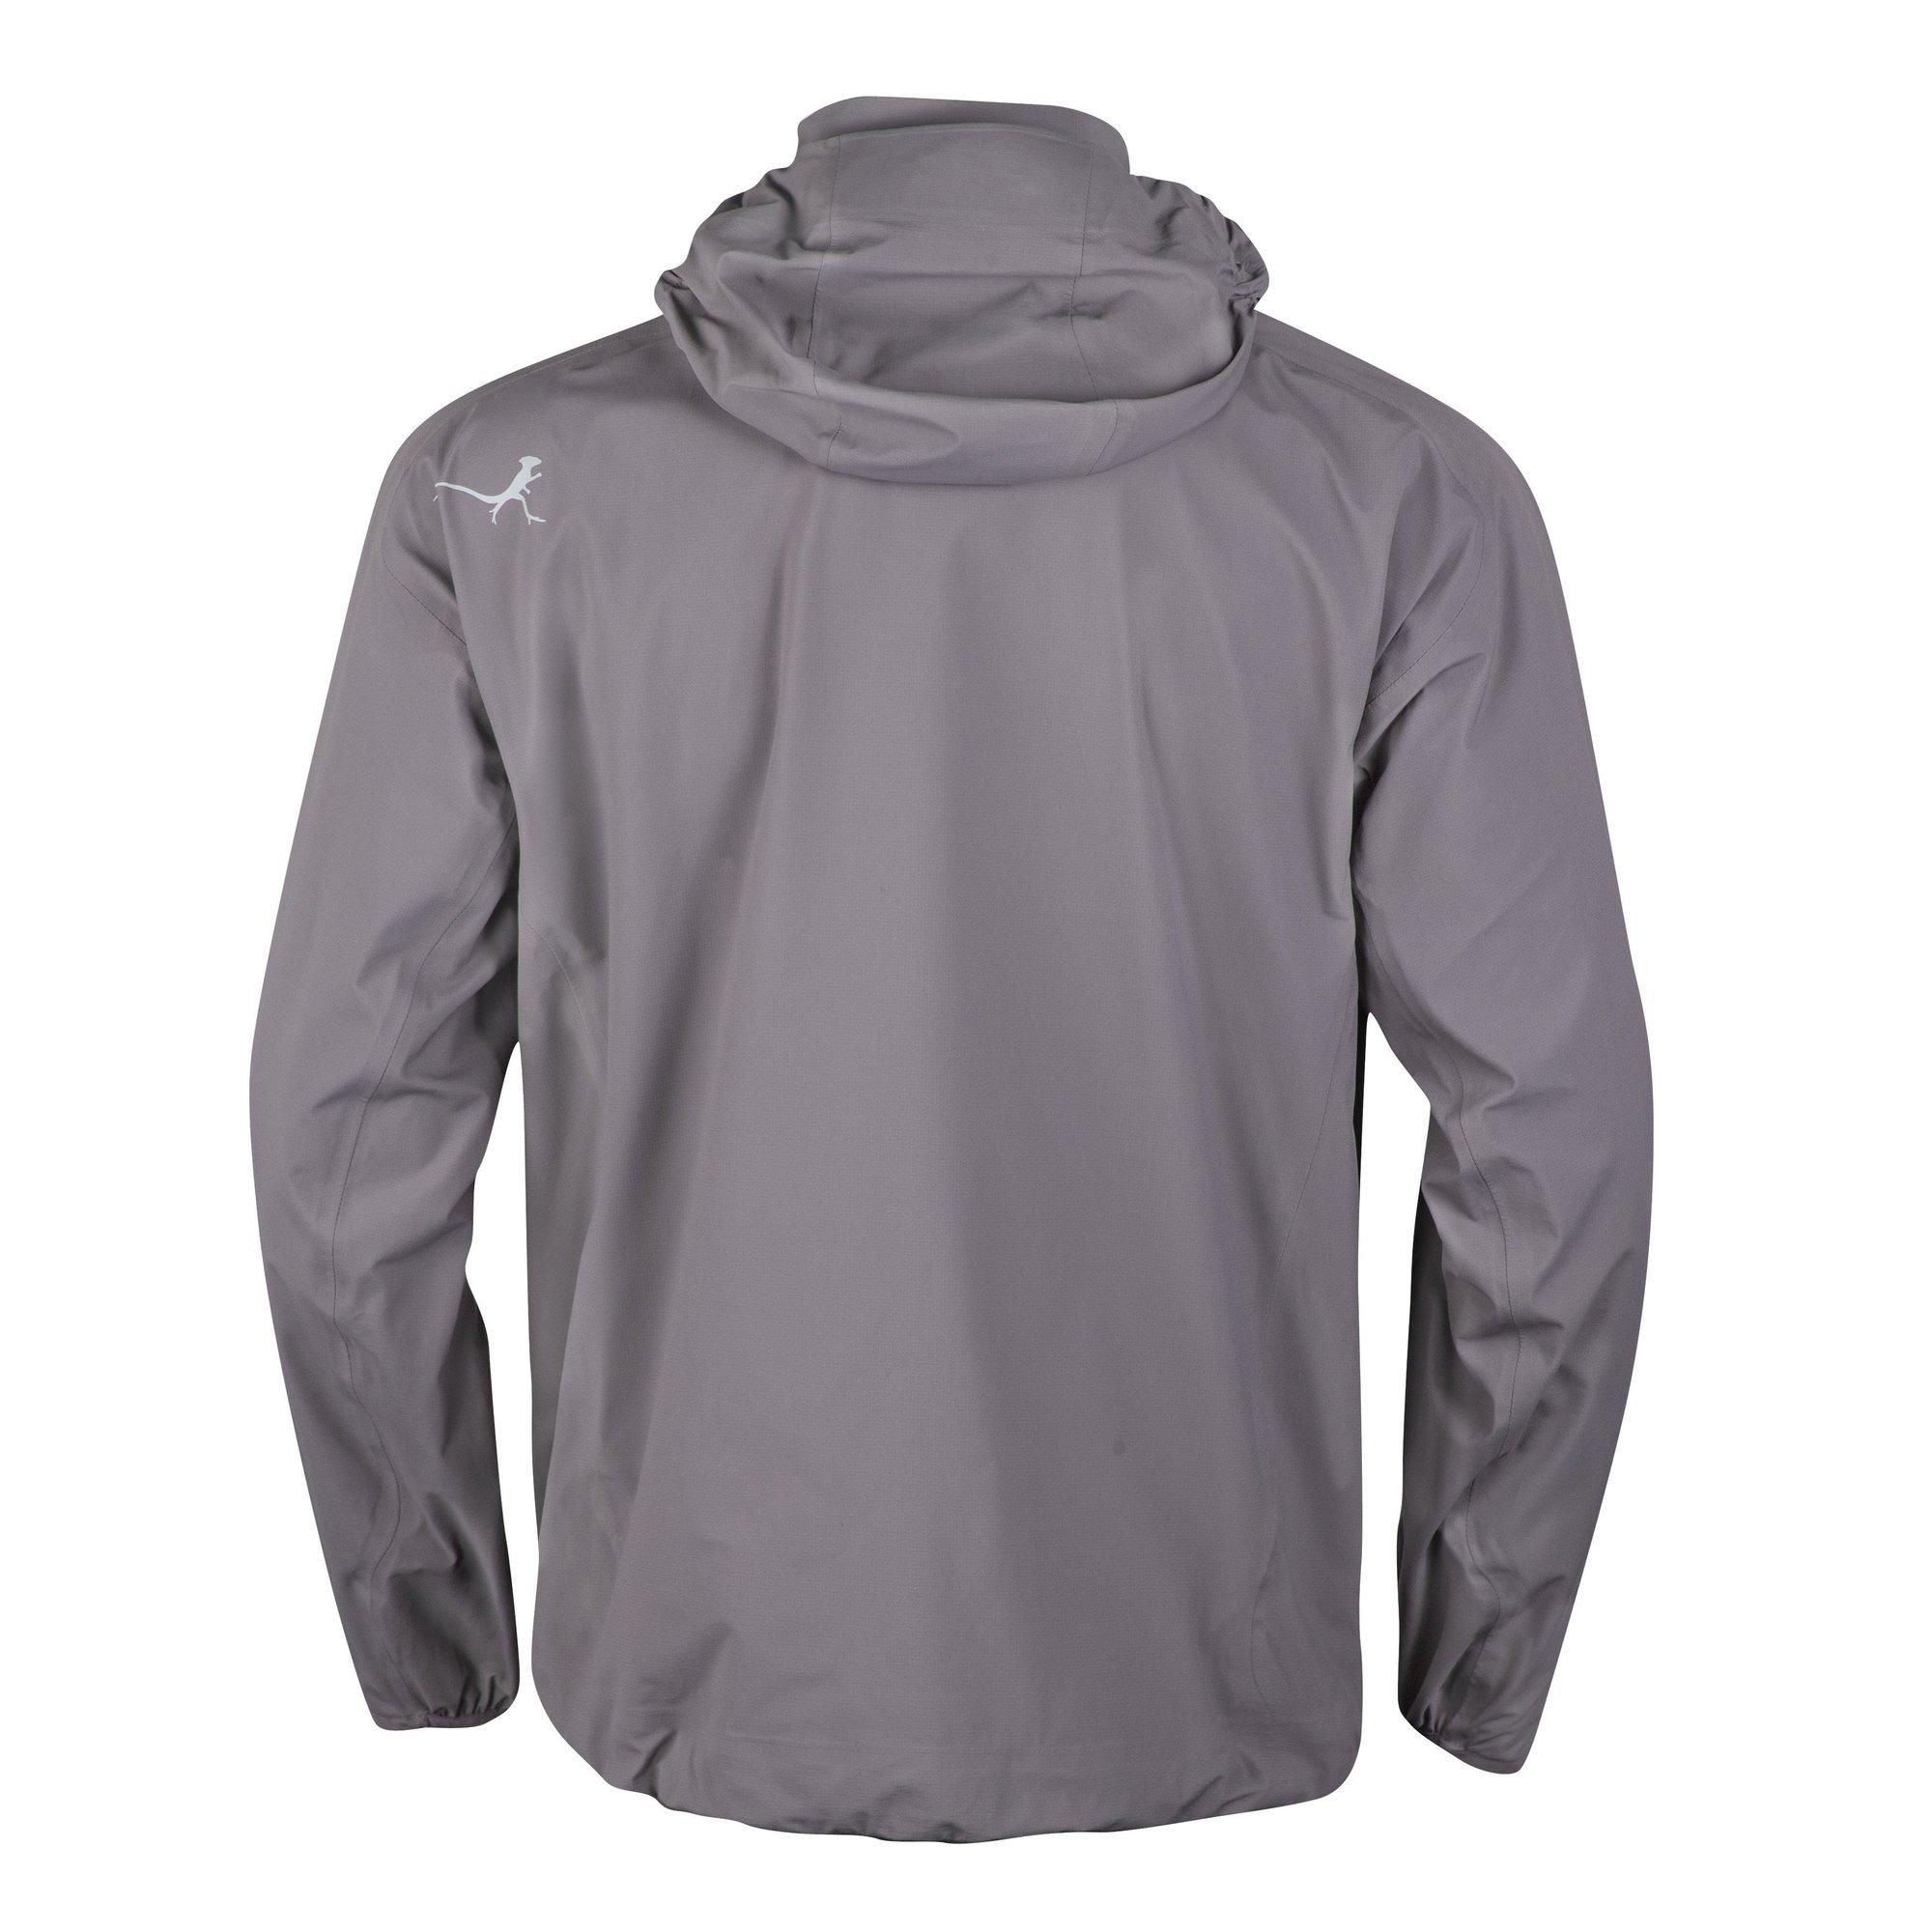 mosko-moto-apparel-deluge-jacket-11333175771197_2000x.jpg